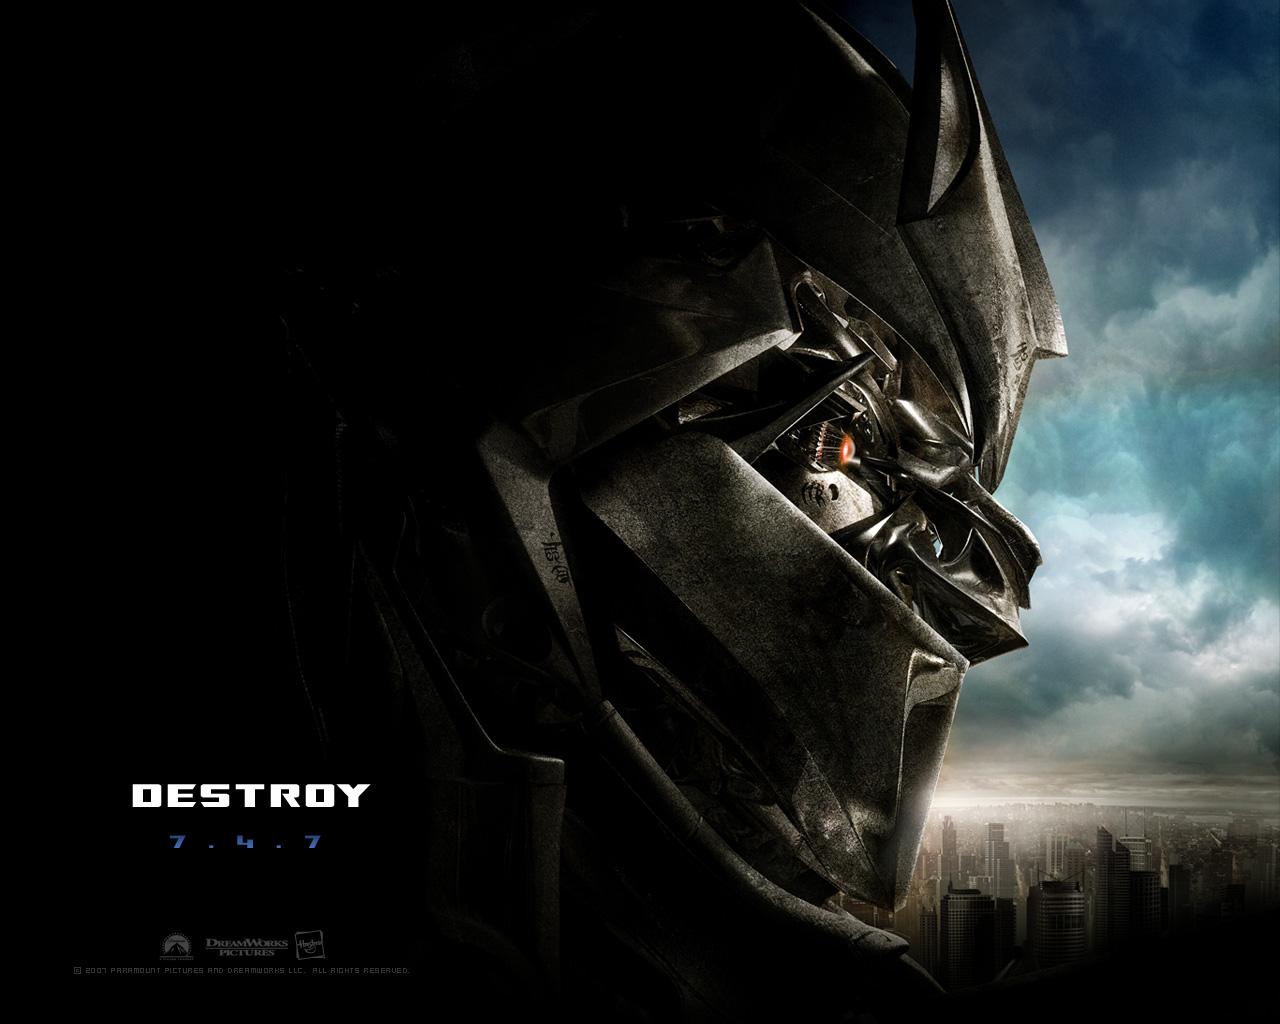 http://2.bp.blogspot.com/-auKtPcn8XXY/UW9h9mNNfKI/AAAAAAAAroE/SDu4c9oC0lQ/s1600/Transformers+wallpaper+(7).jpg